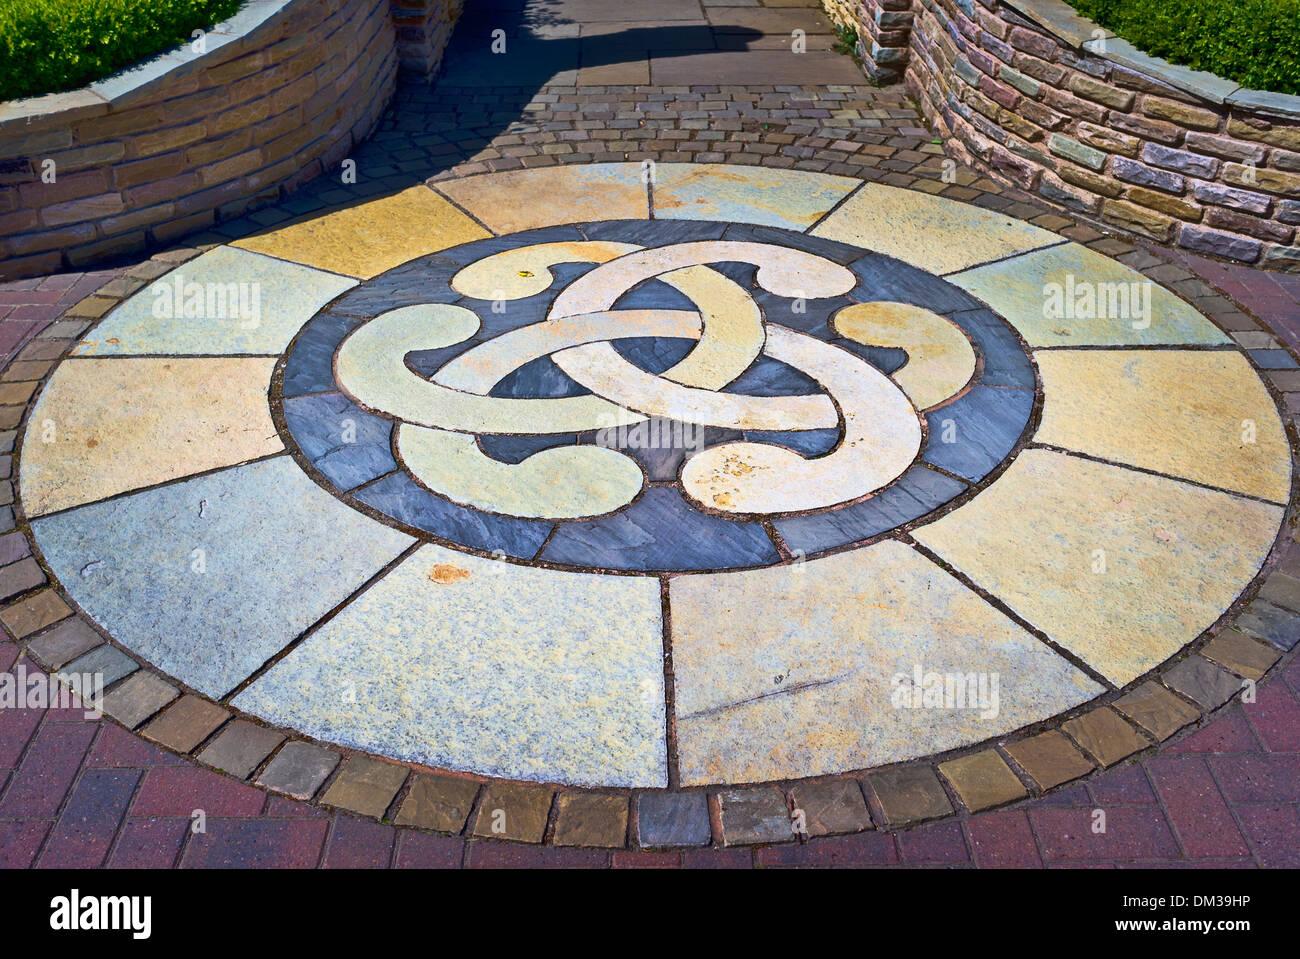 Ornamental Paving Design Using Segments Of A Circle   Stock Image